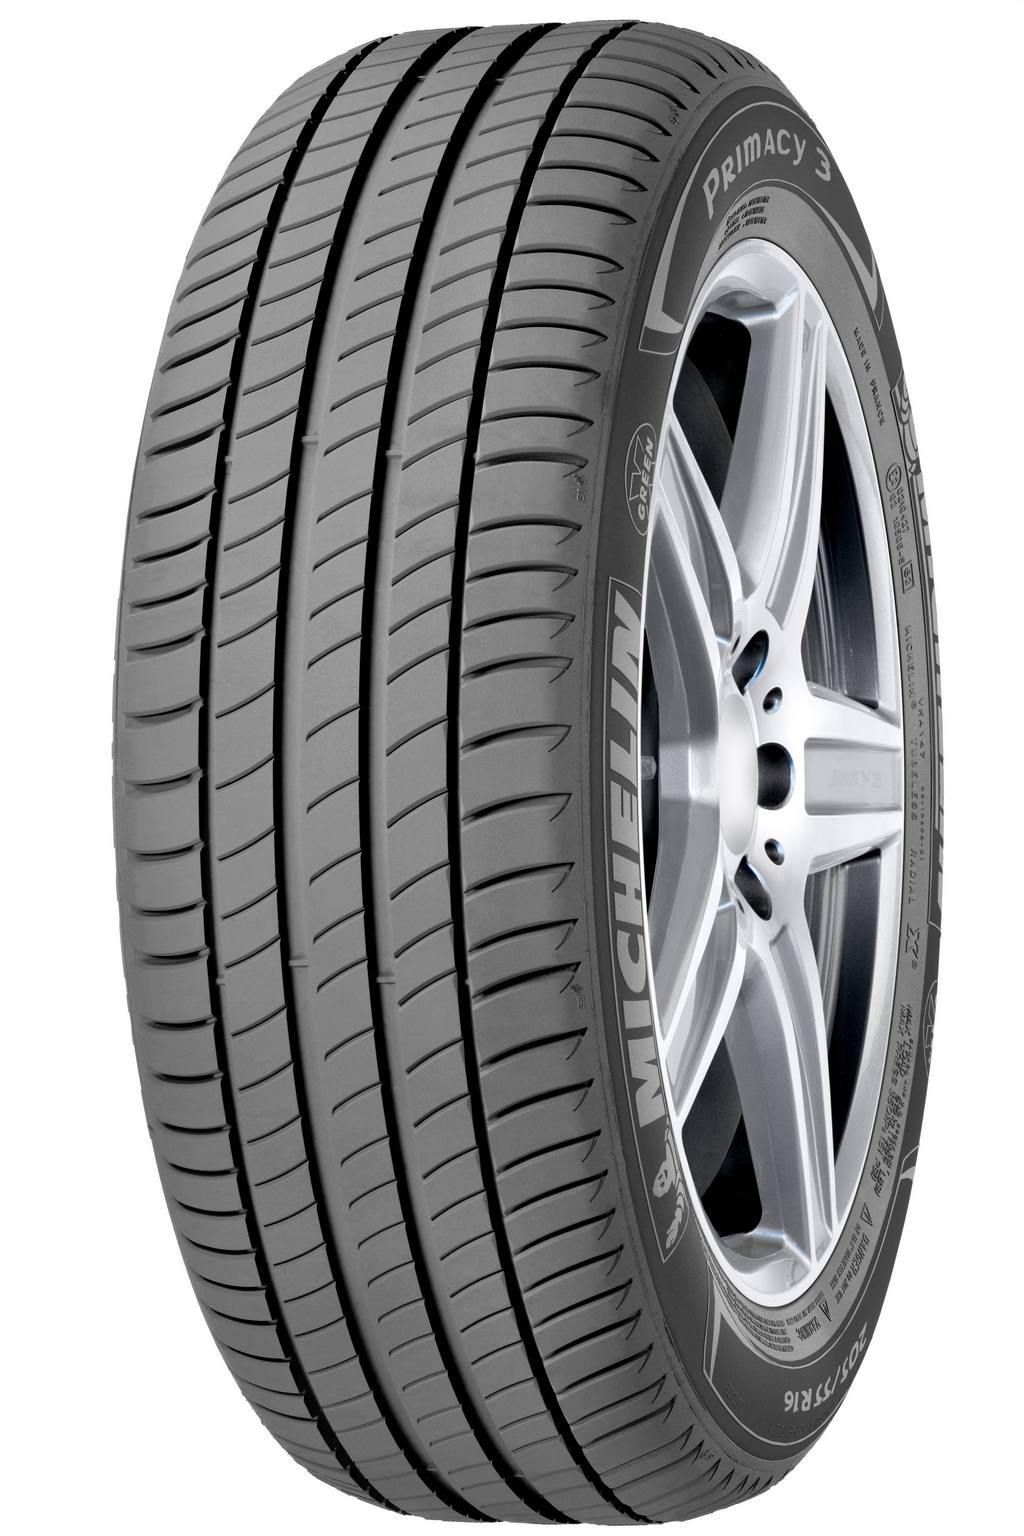 215/50R17 91H, Michelin, PRIMACY 3